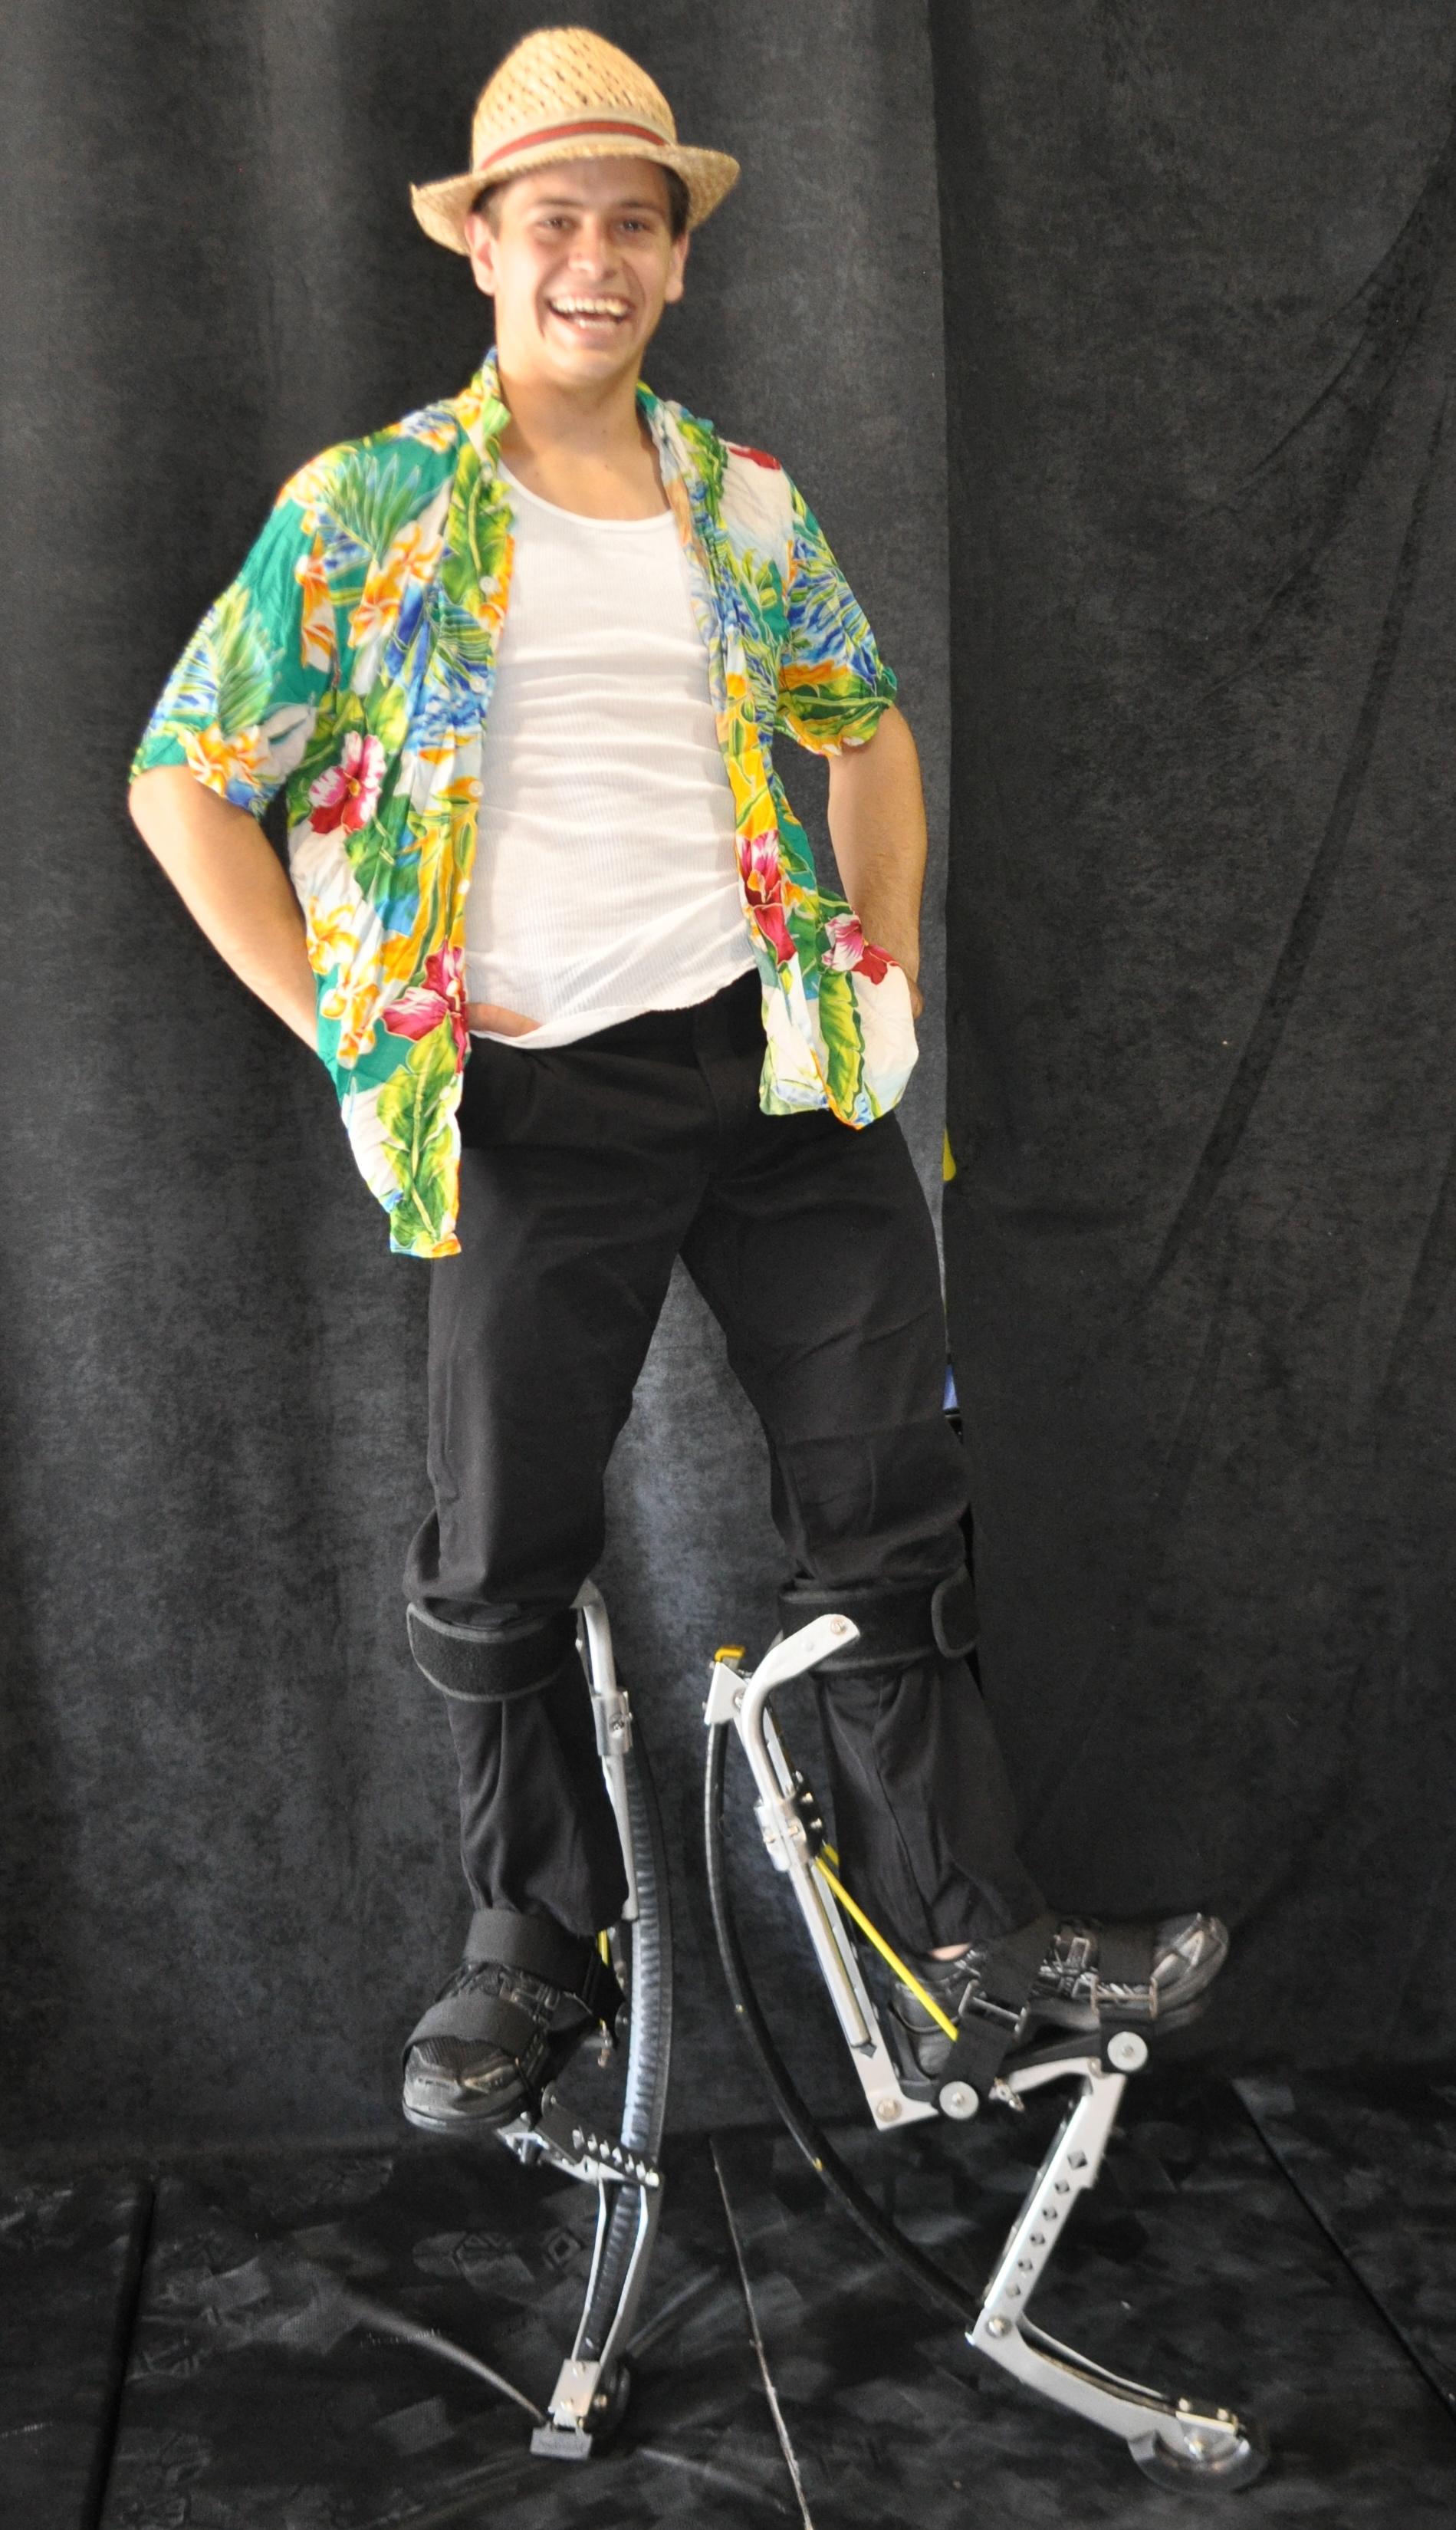 Tourist 1 costume